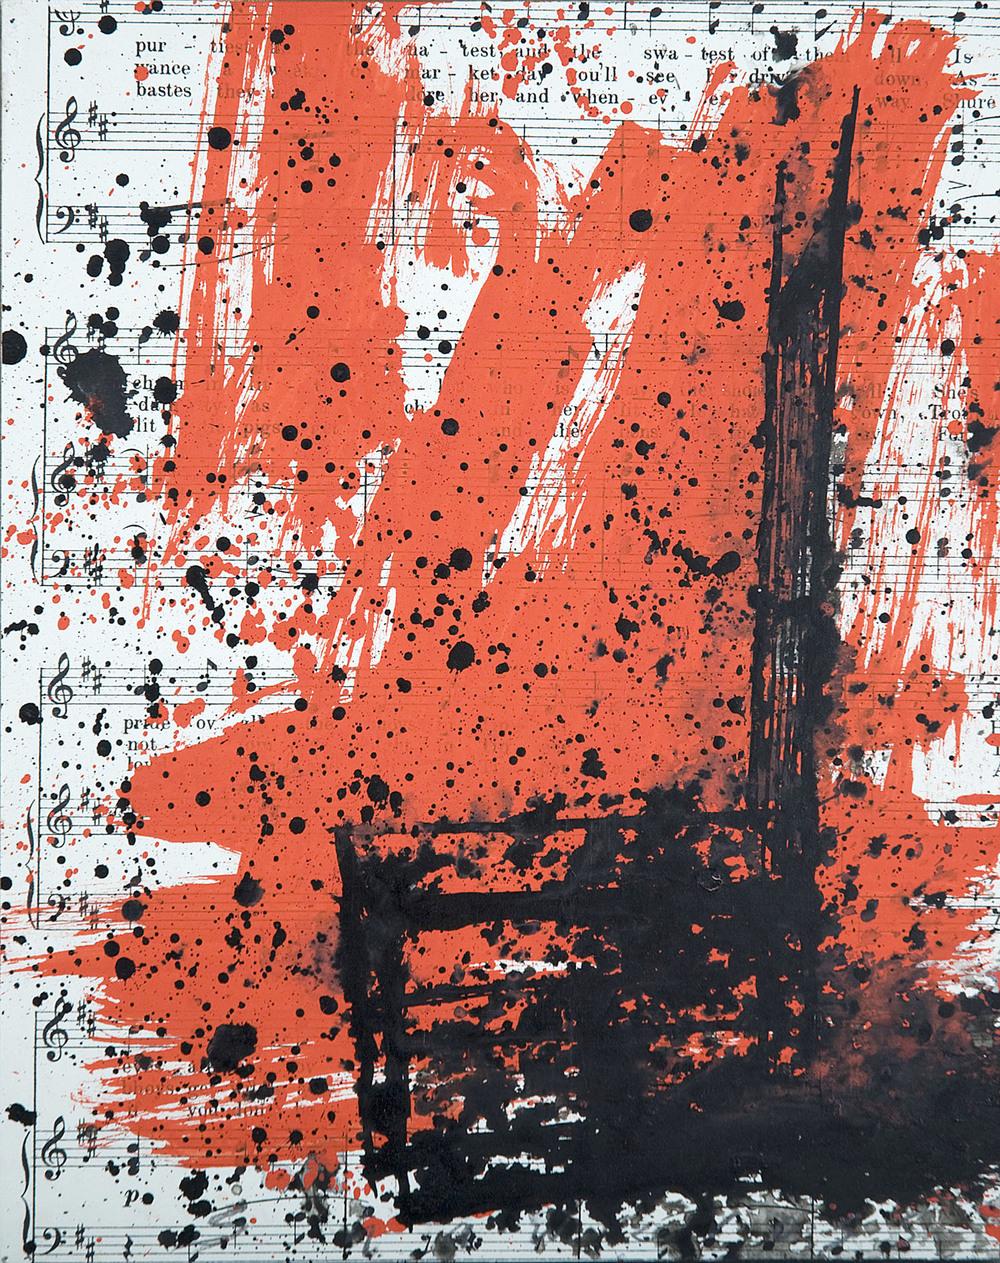 Neil Shawcross_2007_Chair #25_acrylic on board_25.5 x 20cm.jpg